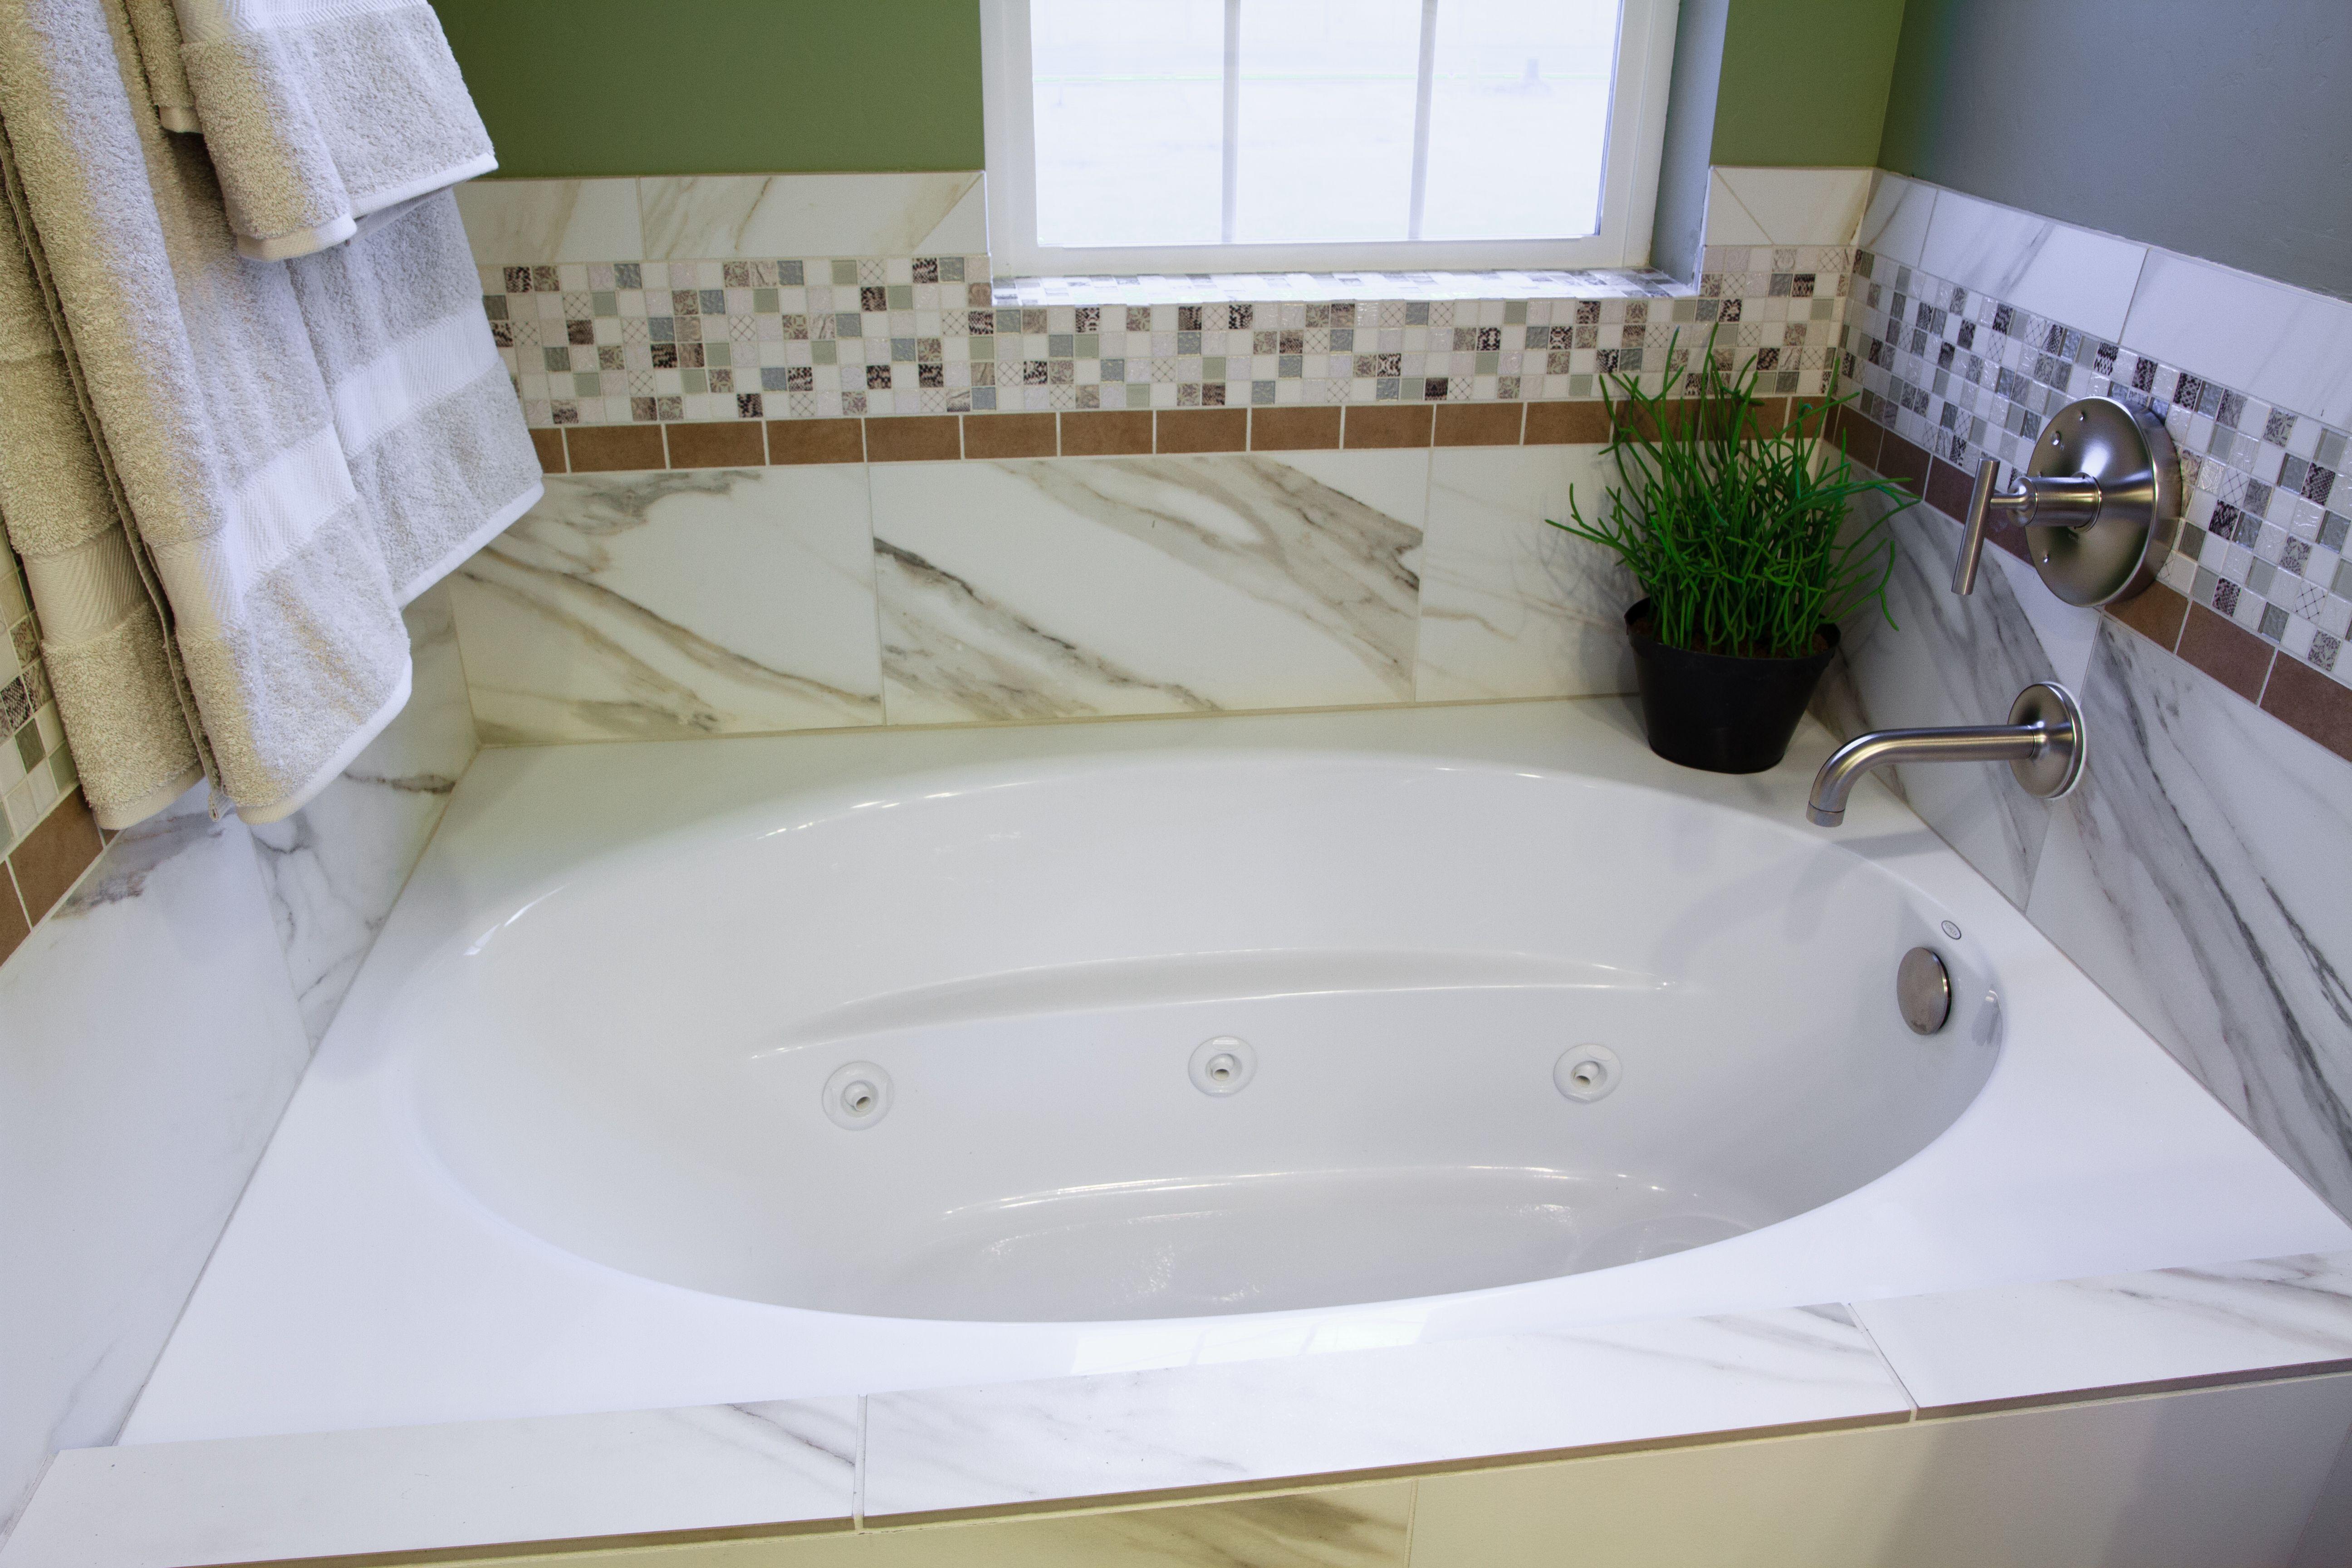 Amazing Utah Home Designs Gift - Home Decorating Ideas - svvodka.com